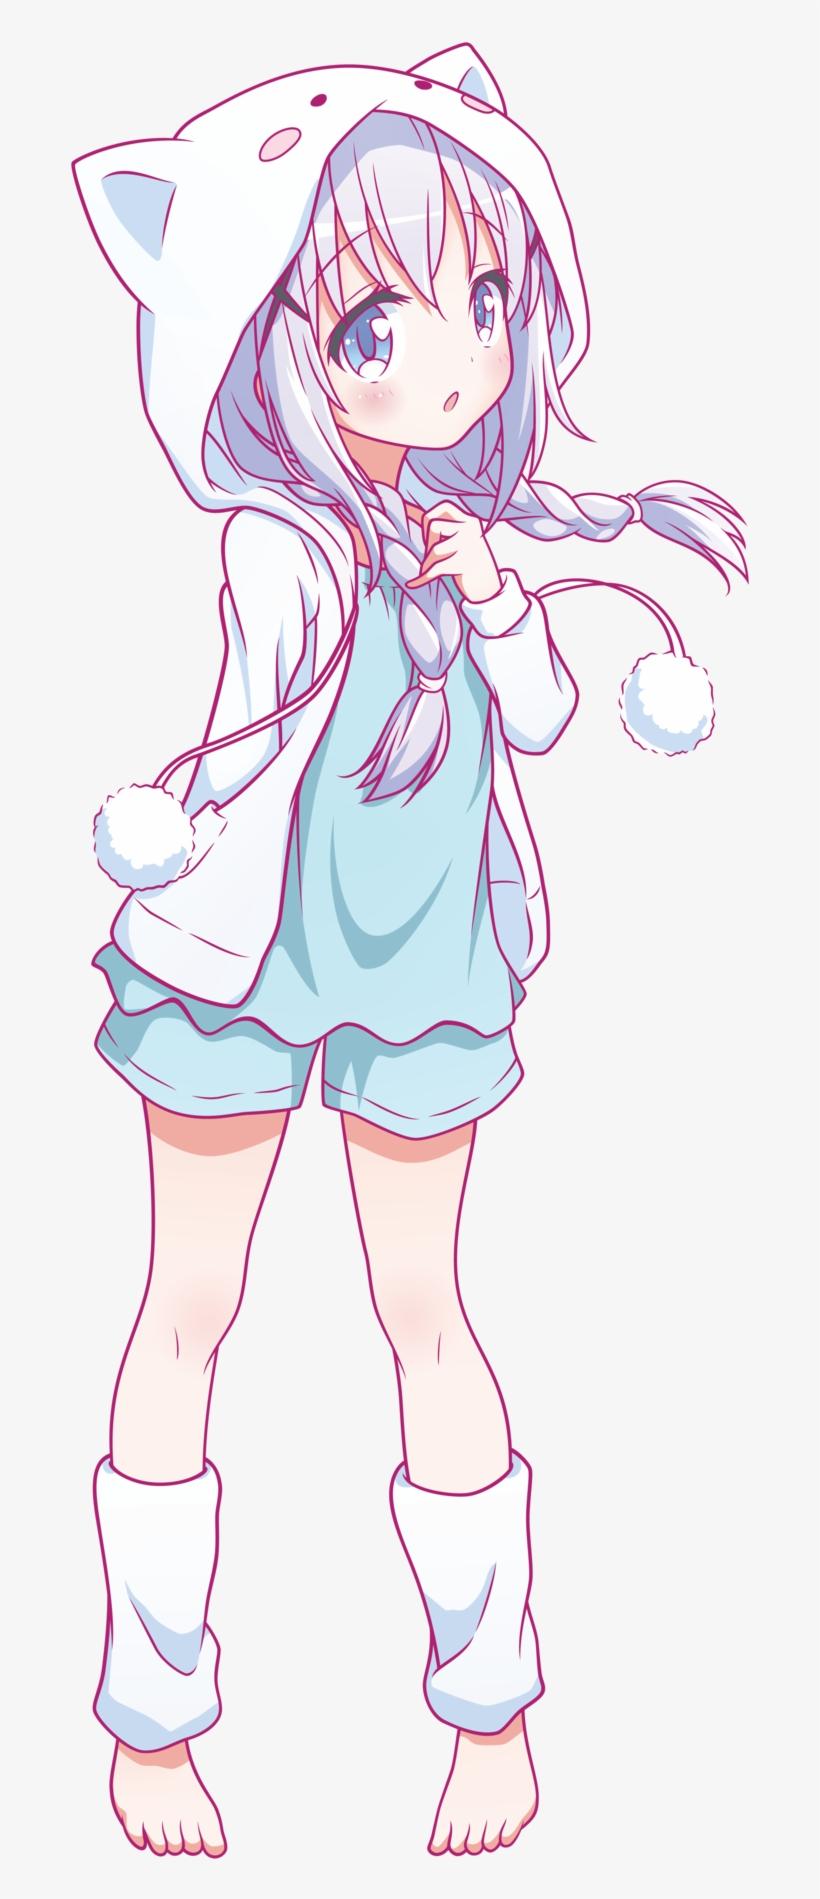 Chibi Neko Girl by axelsflame0o on DeviantArt  |Chibi Anime Neko Girl